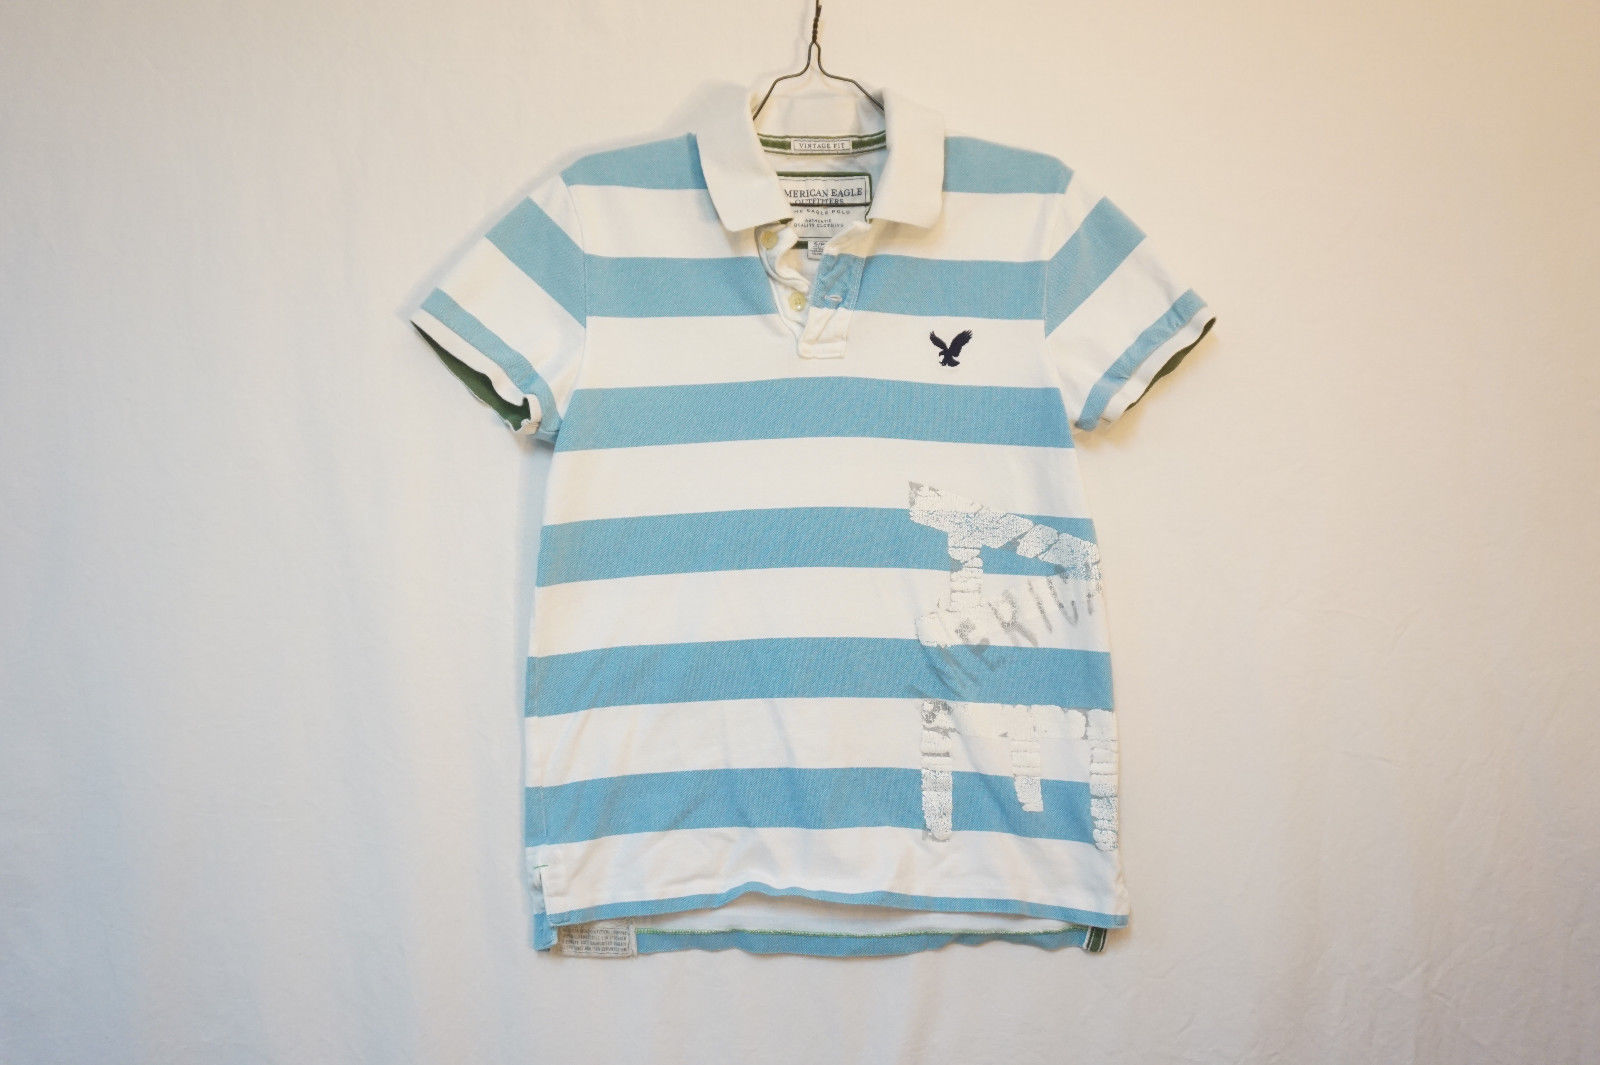 9e2981db4b8 American Eagle Midweight Cotton Polo Shirt, Striped, Men's Small 8532 -  $13.17